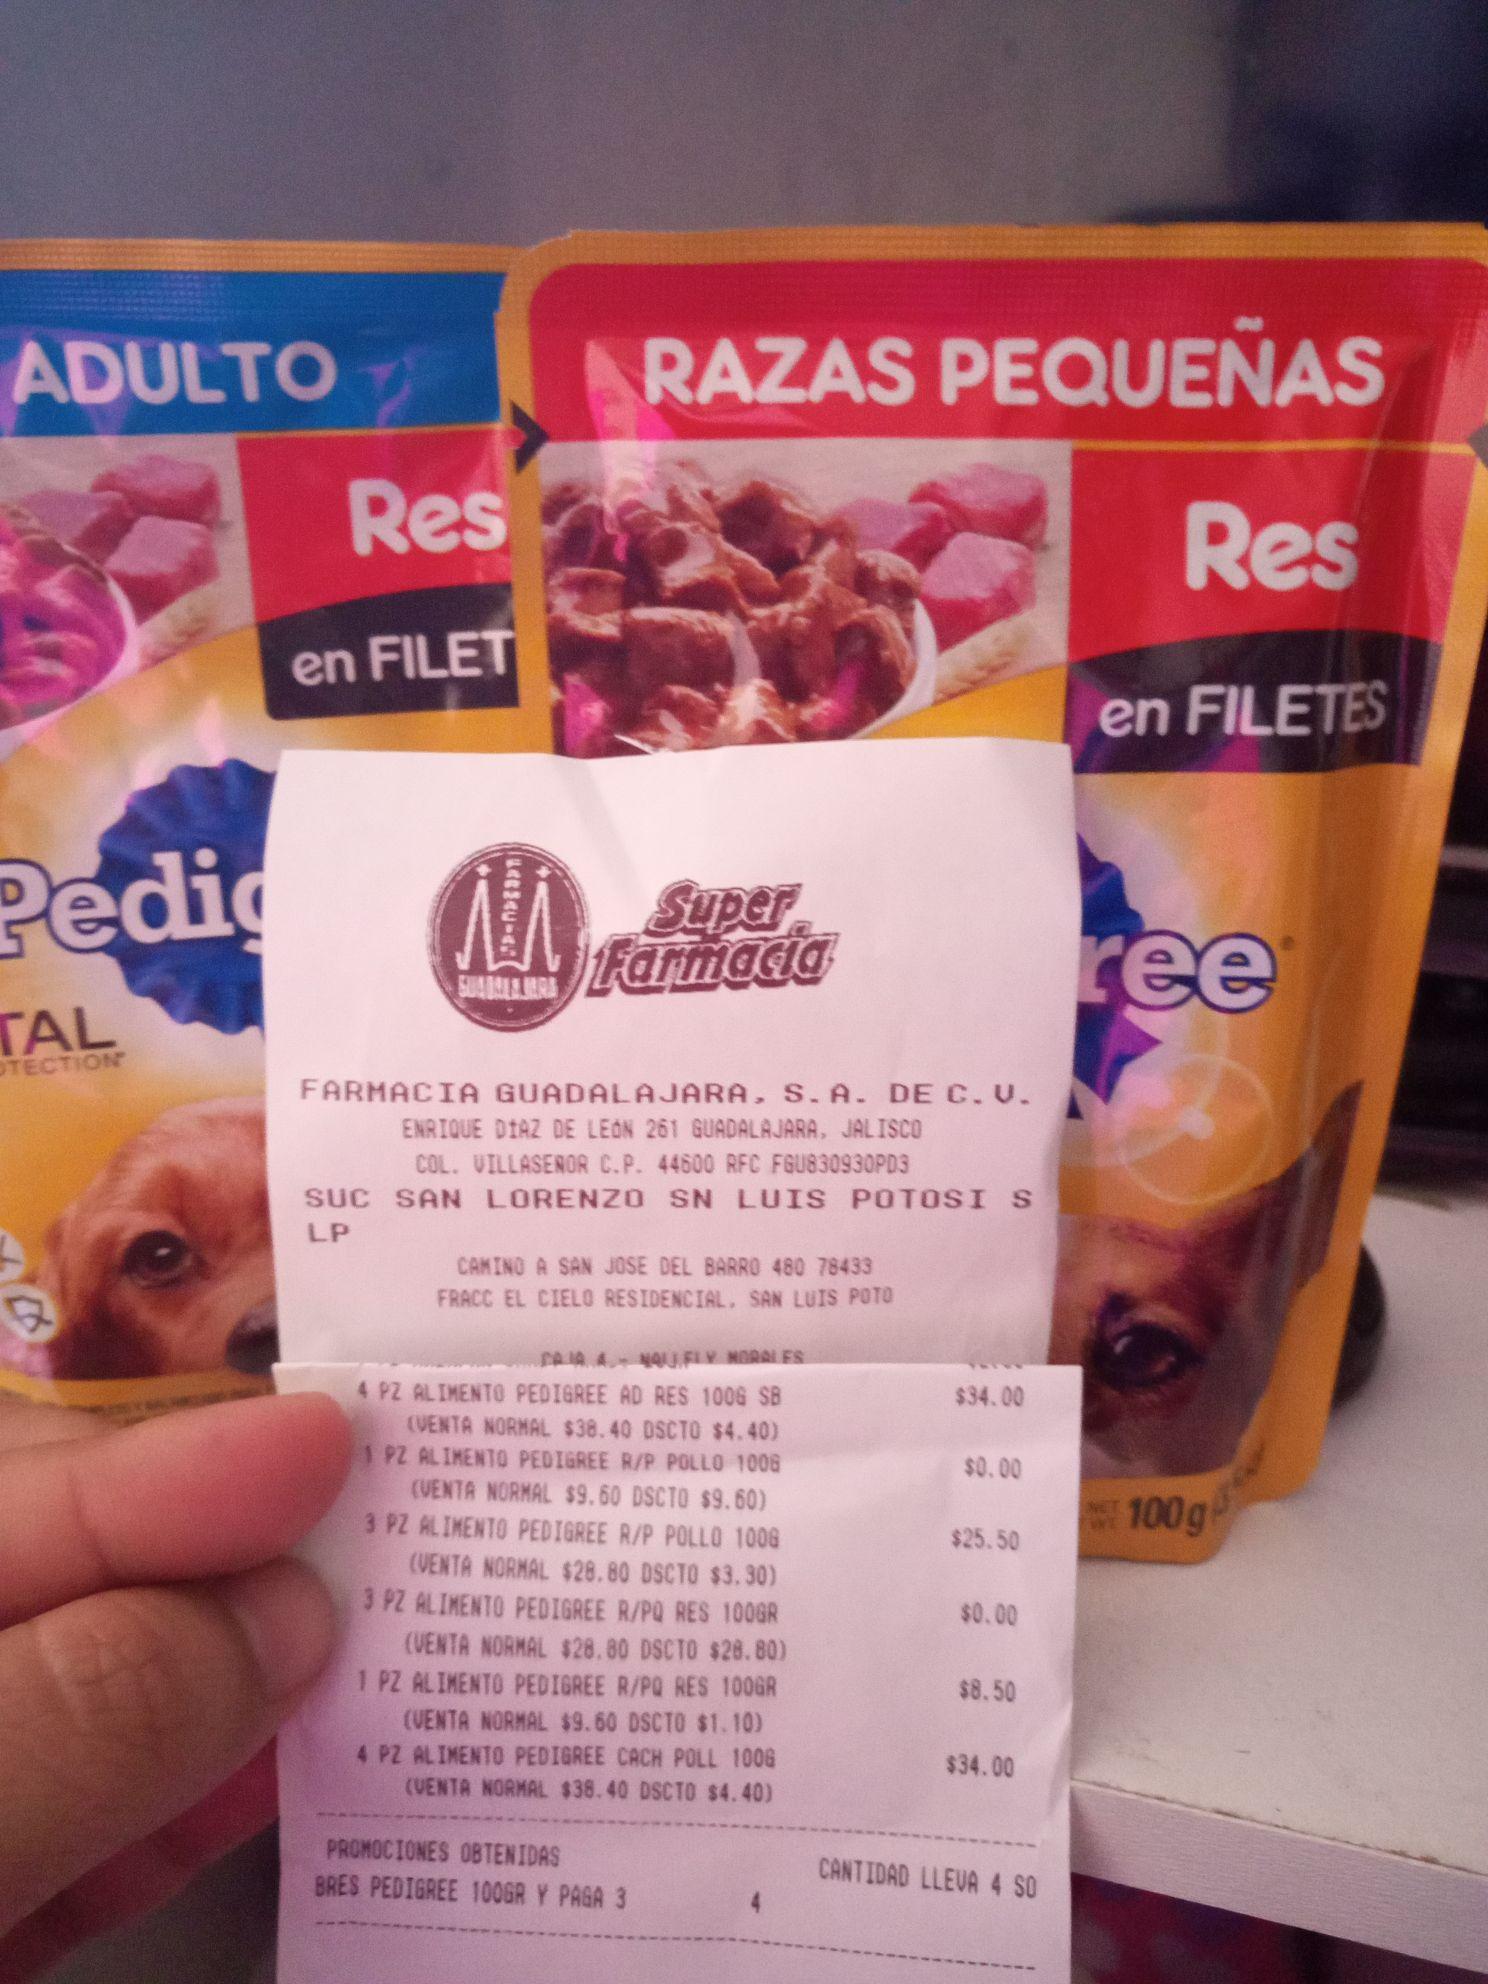 Farmacias Guadalajara: 4x3 en sobres de alimento pedigree